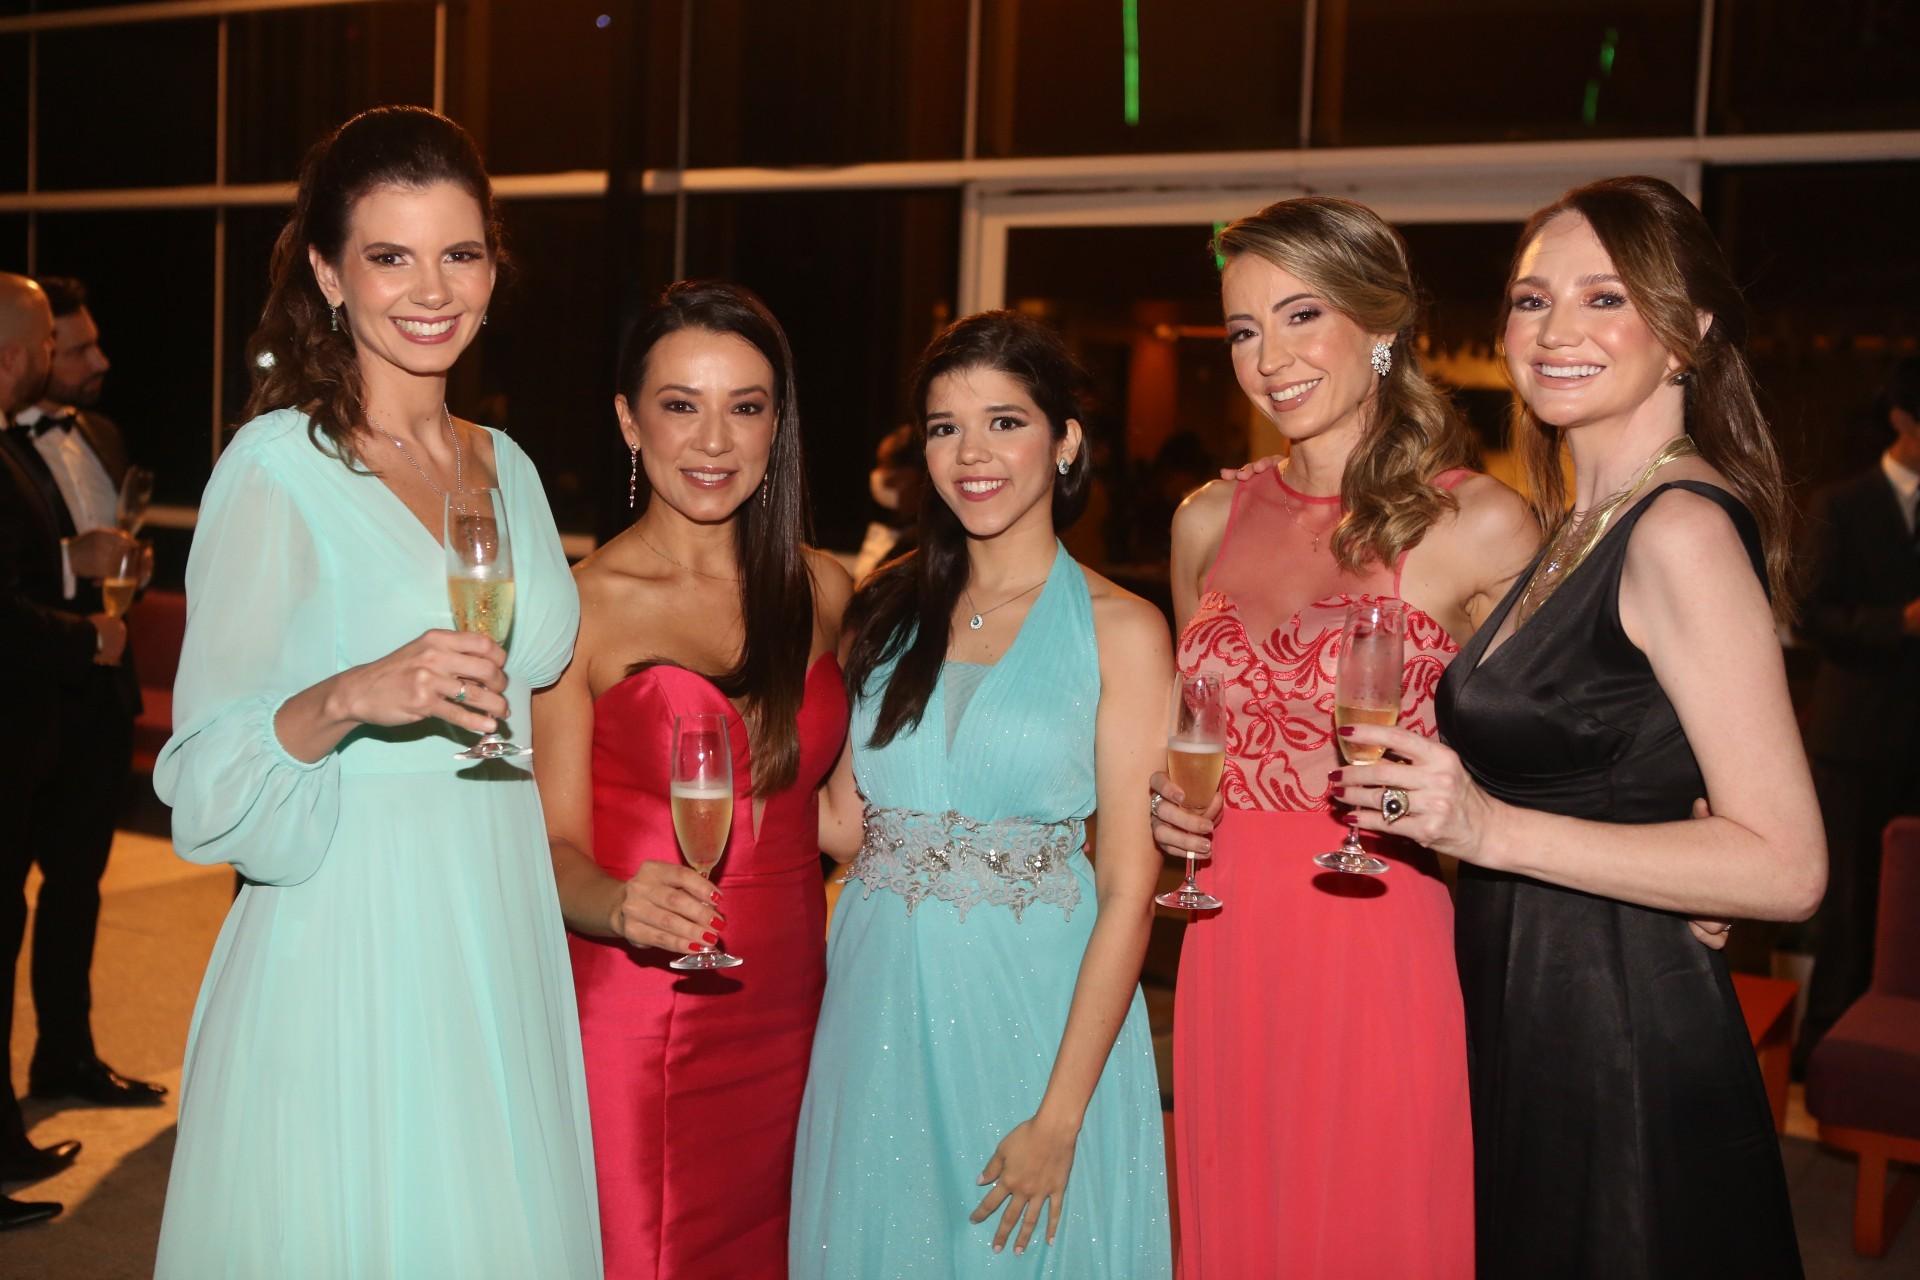 (Foto: JOÃO FILHO TAVARES)Ana Carolina Studart, Andressa Ballarin, Jordana Guimaraes, Tayanna Graga e Margarita Ubaldo